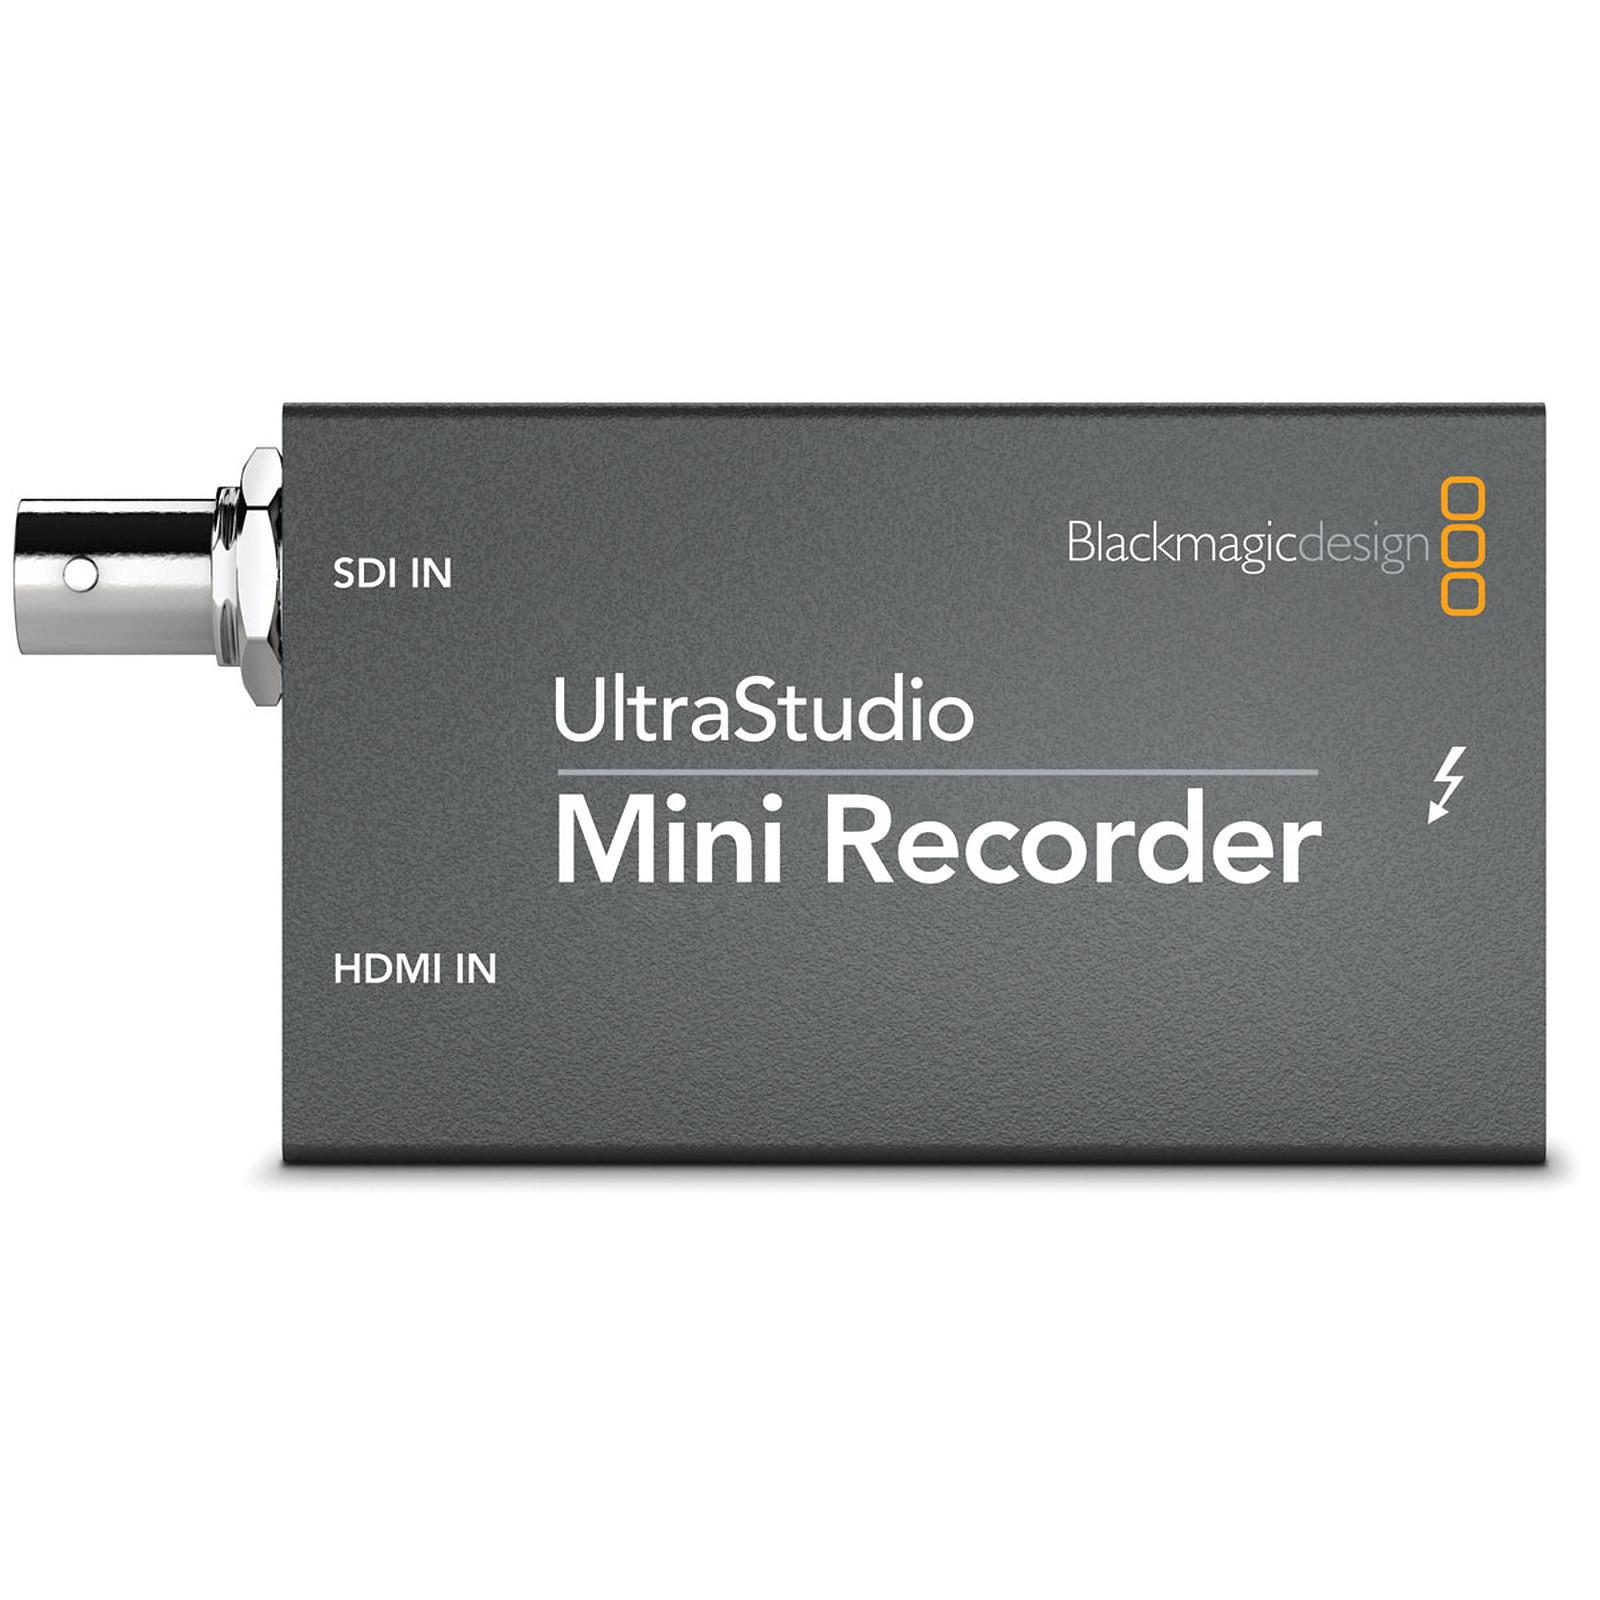 Blackmagic Design Ultrastudio Mini Recorder Tarjeta Capturadora Blackmagic Design En Ldlc Com Musericordia